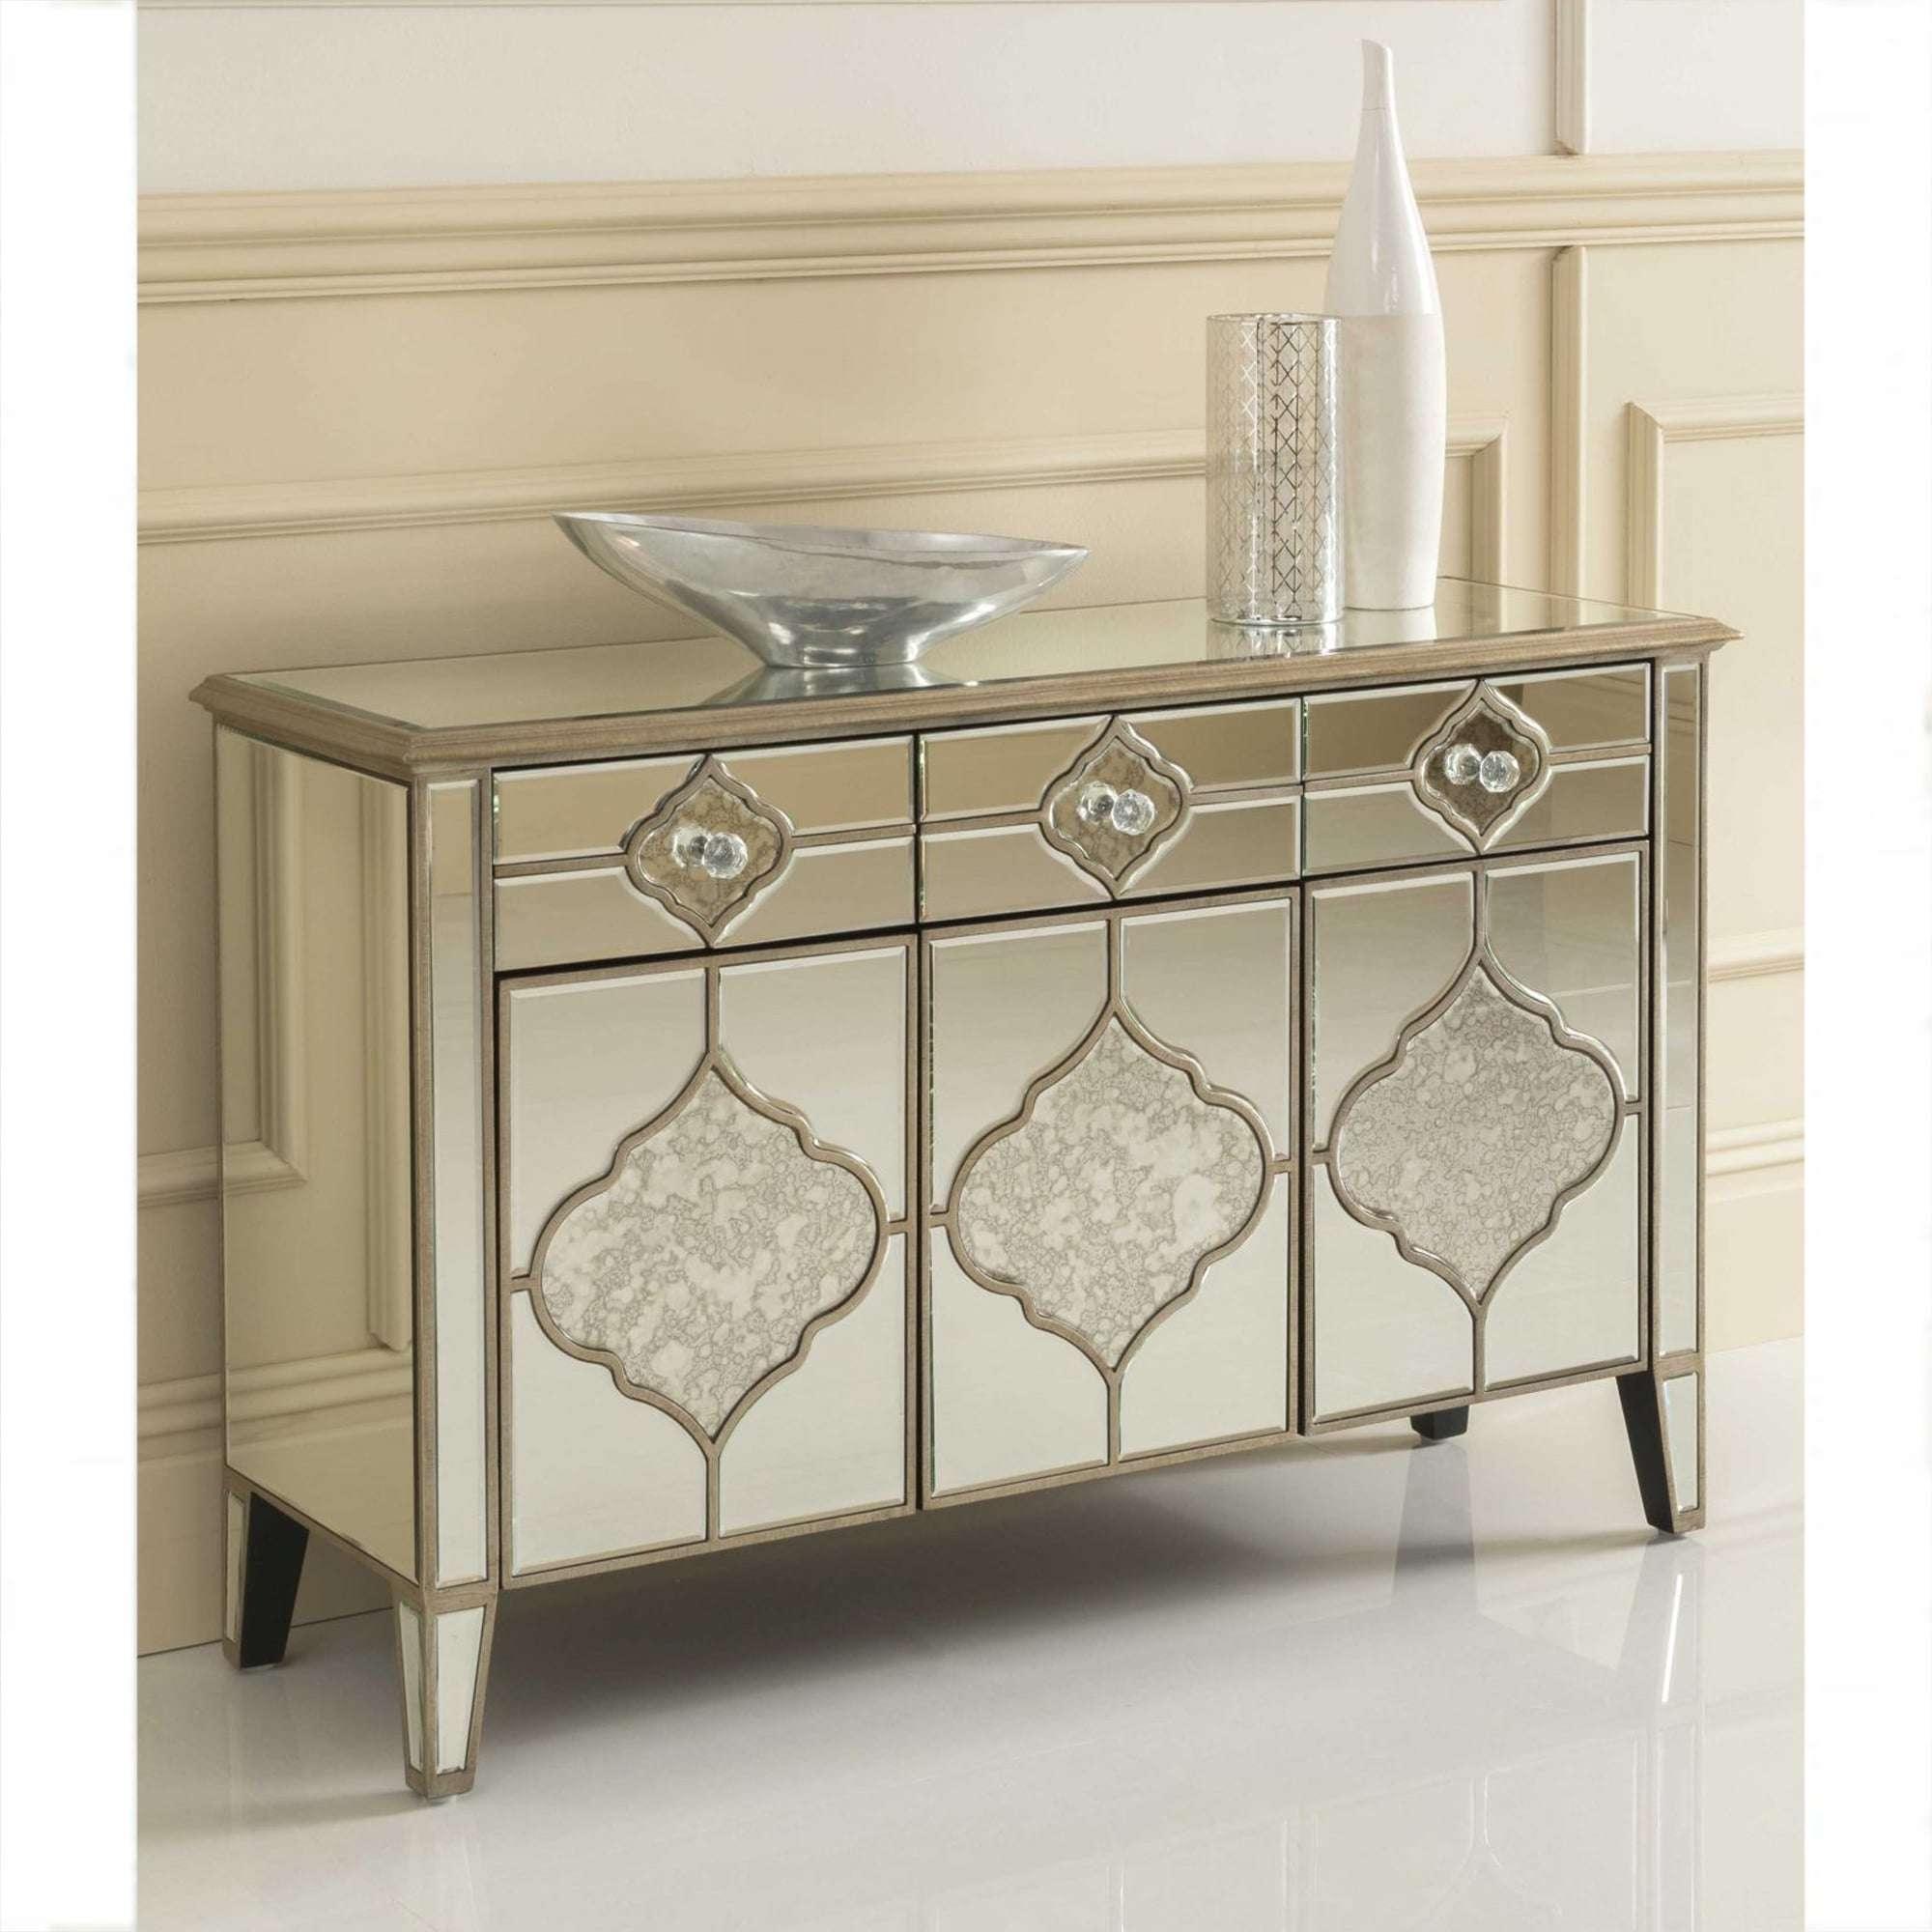 Sassari Mirrored Sideboard | Venetian Glass Furniture Within Mirror Sideboards (View 15 of 20)